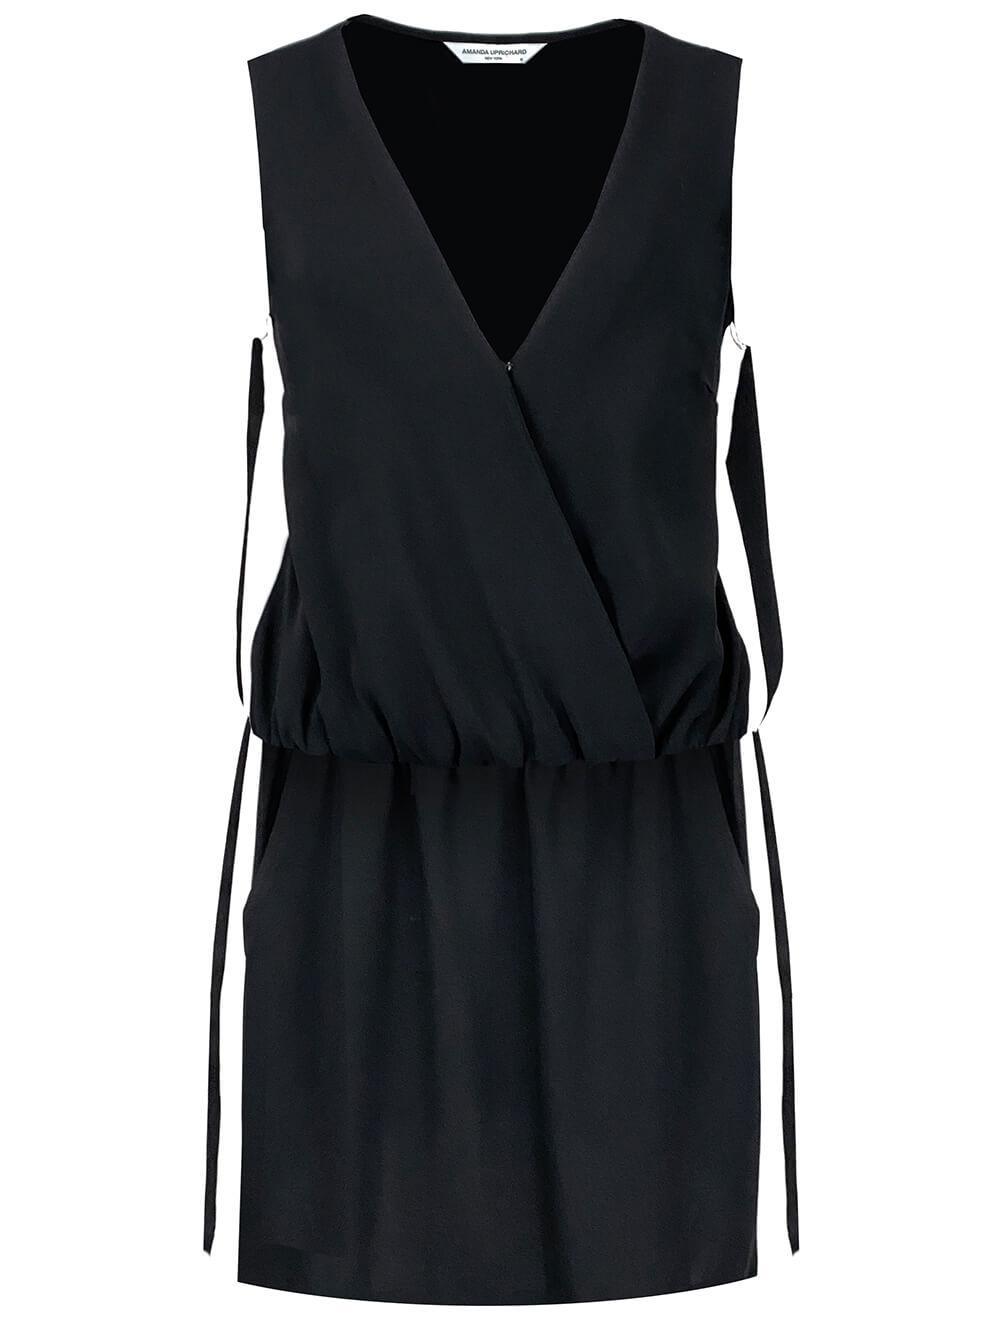 Harvey Dress Item # CI-21416